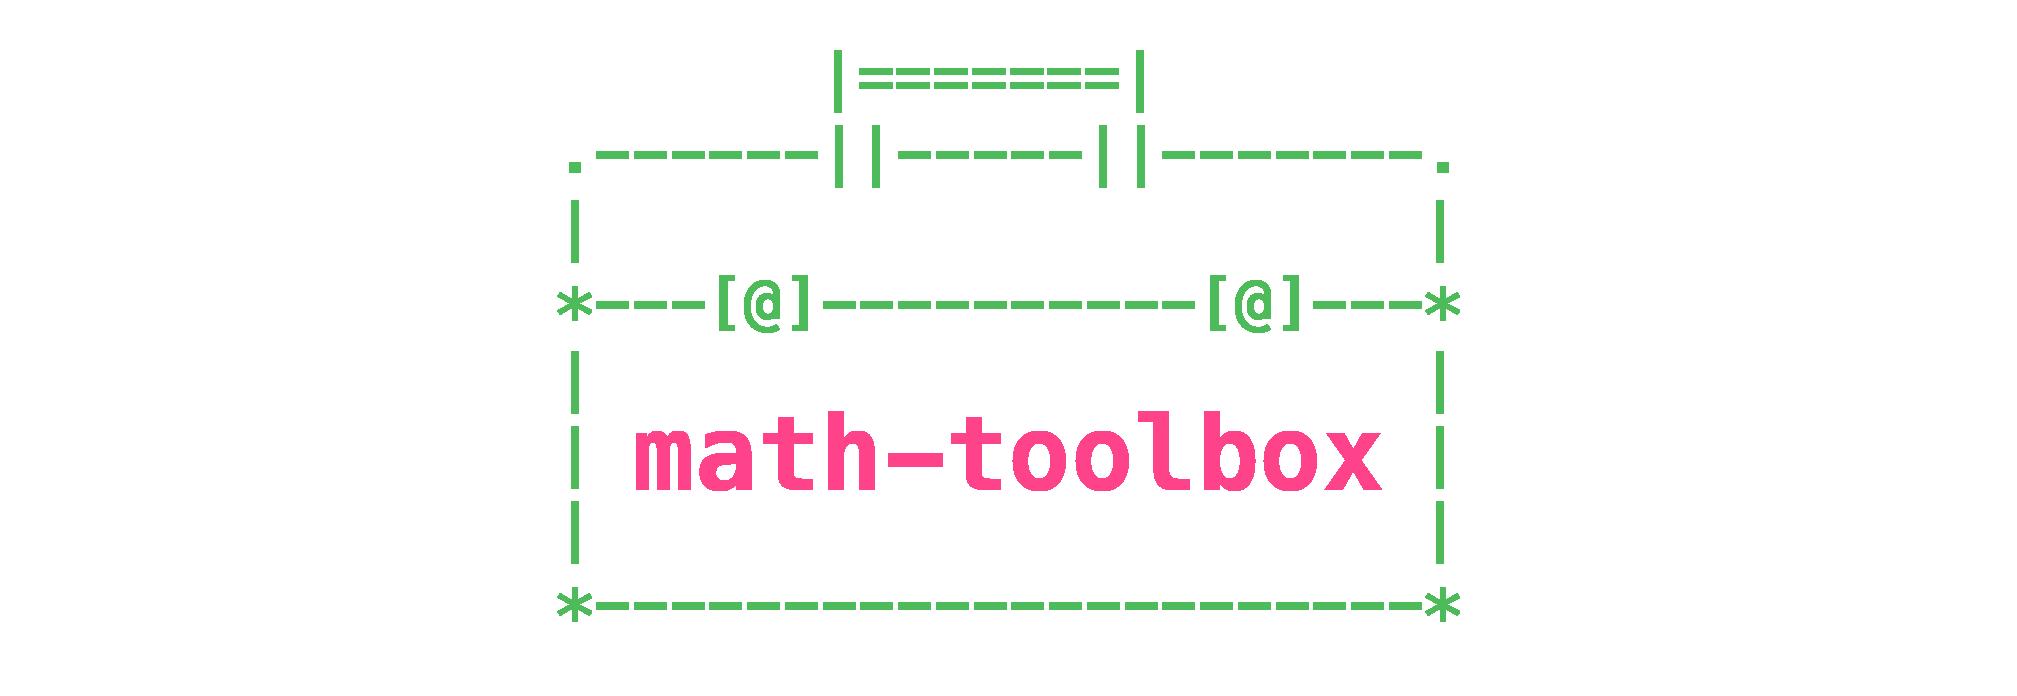 math-toolbox